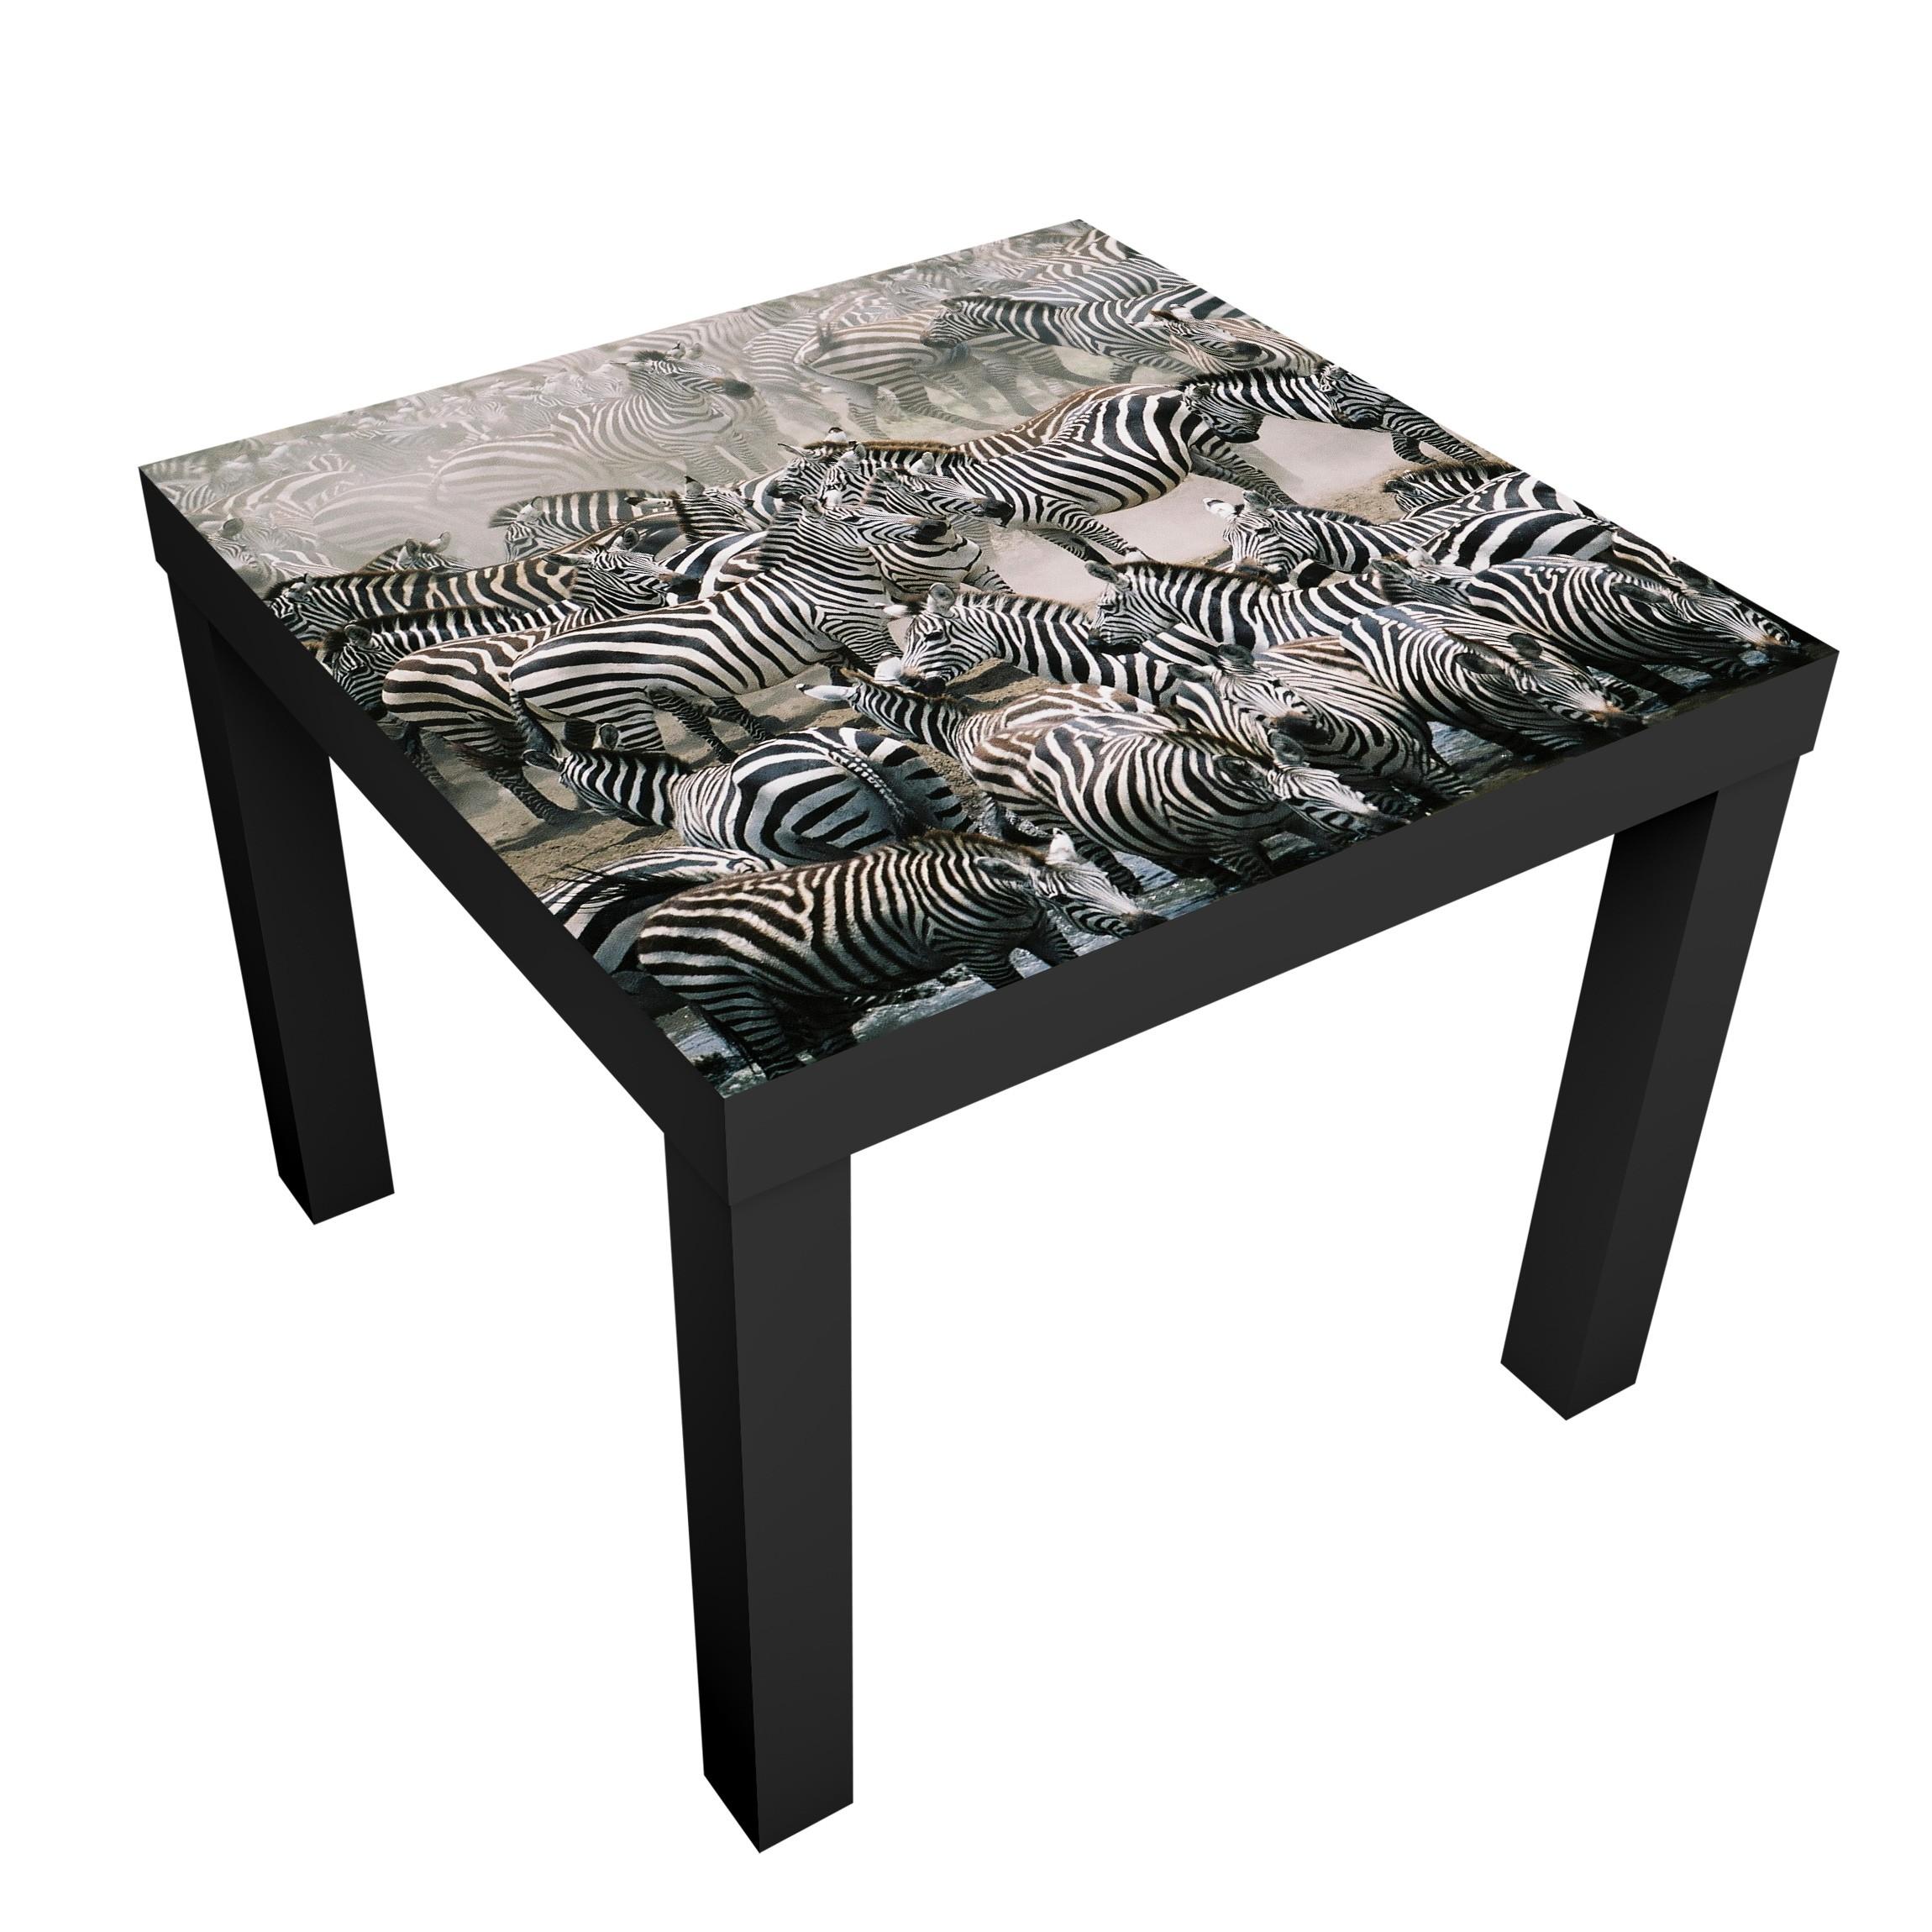 Carta adesiva per mobili ikea lack tavolino zebra herd - Carta per foderare mobili ...